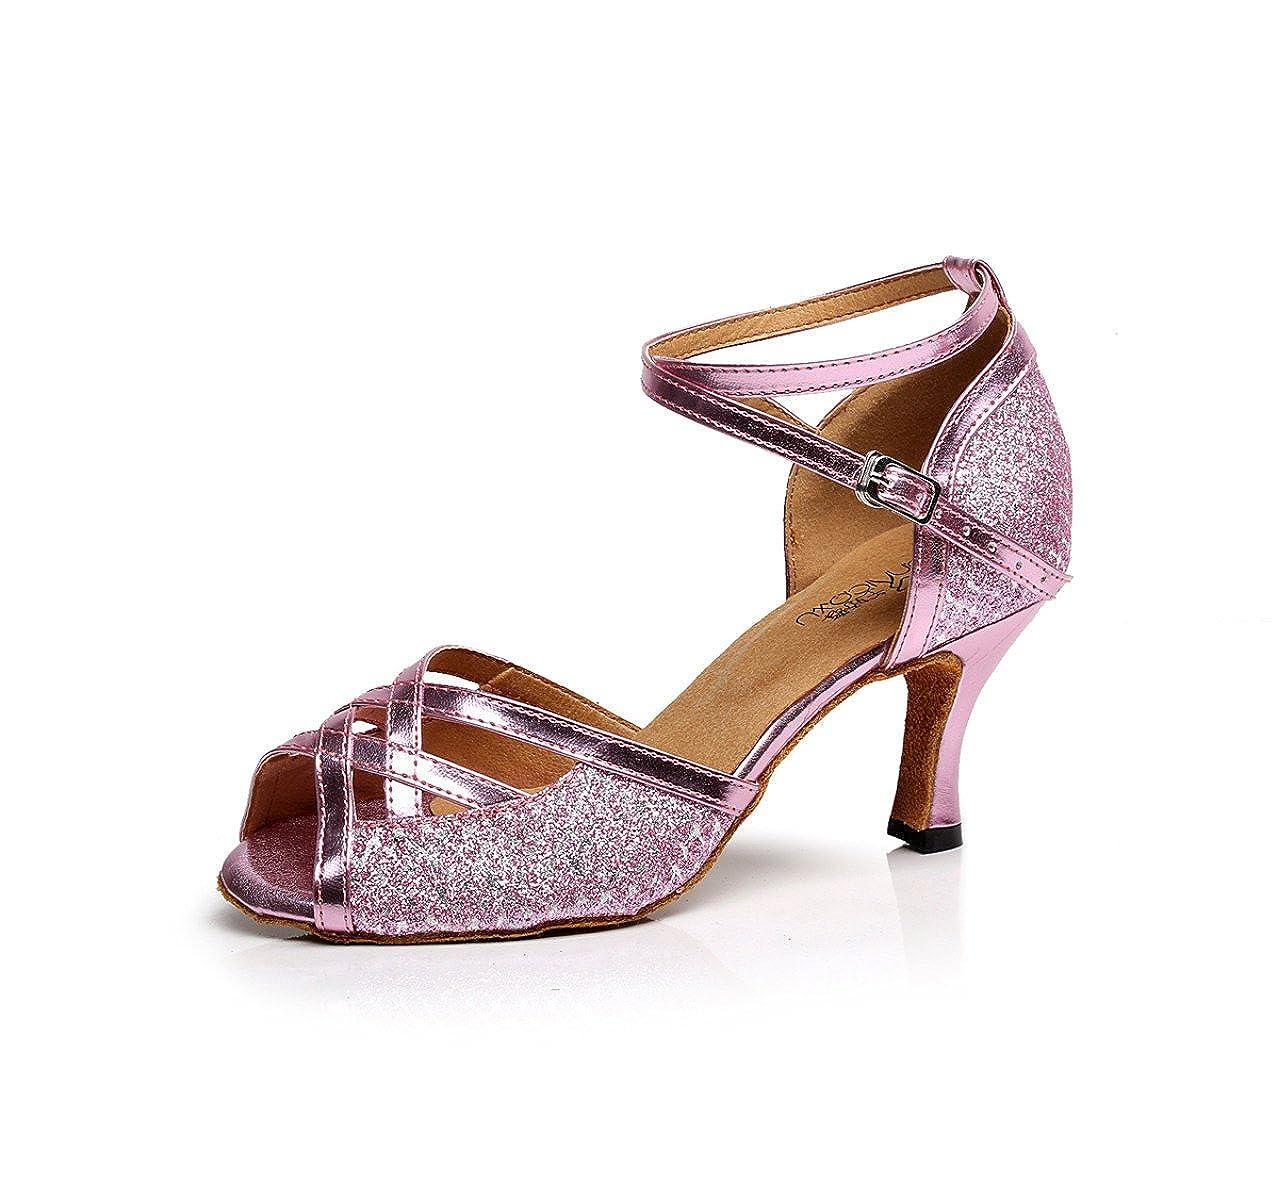 JSHOE Chaussures de Danse pour Femmes Latin B07G4C2ZQ1 Latin Salsa/Tango Chaussures/Thé/Samba/Moderne/Jazz Chaussures Sandales Talons Hauts,Pink-heeled7.5cm-UK3.5/EU34/Our35 - bf0e612 - automaticcouplings.space